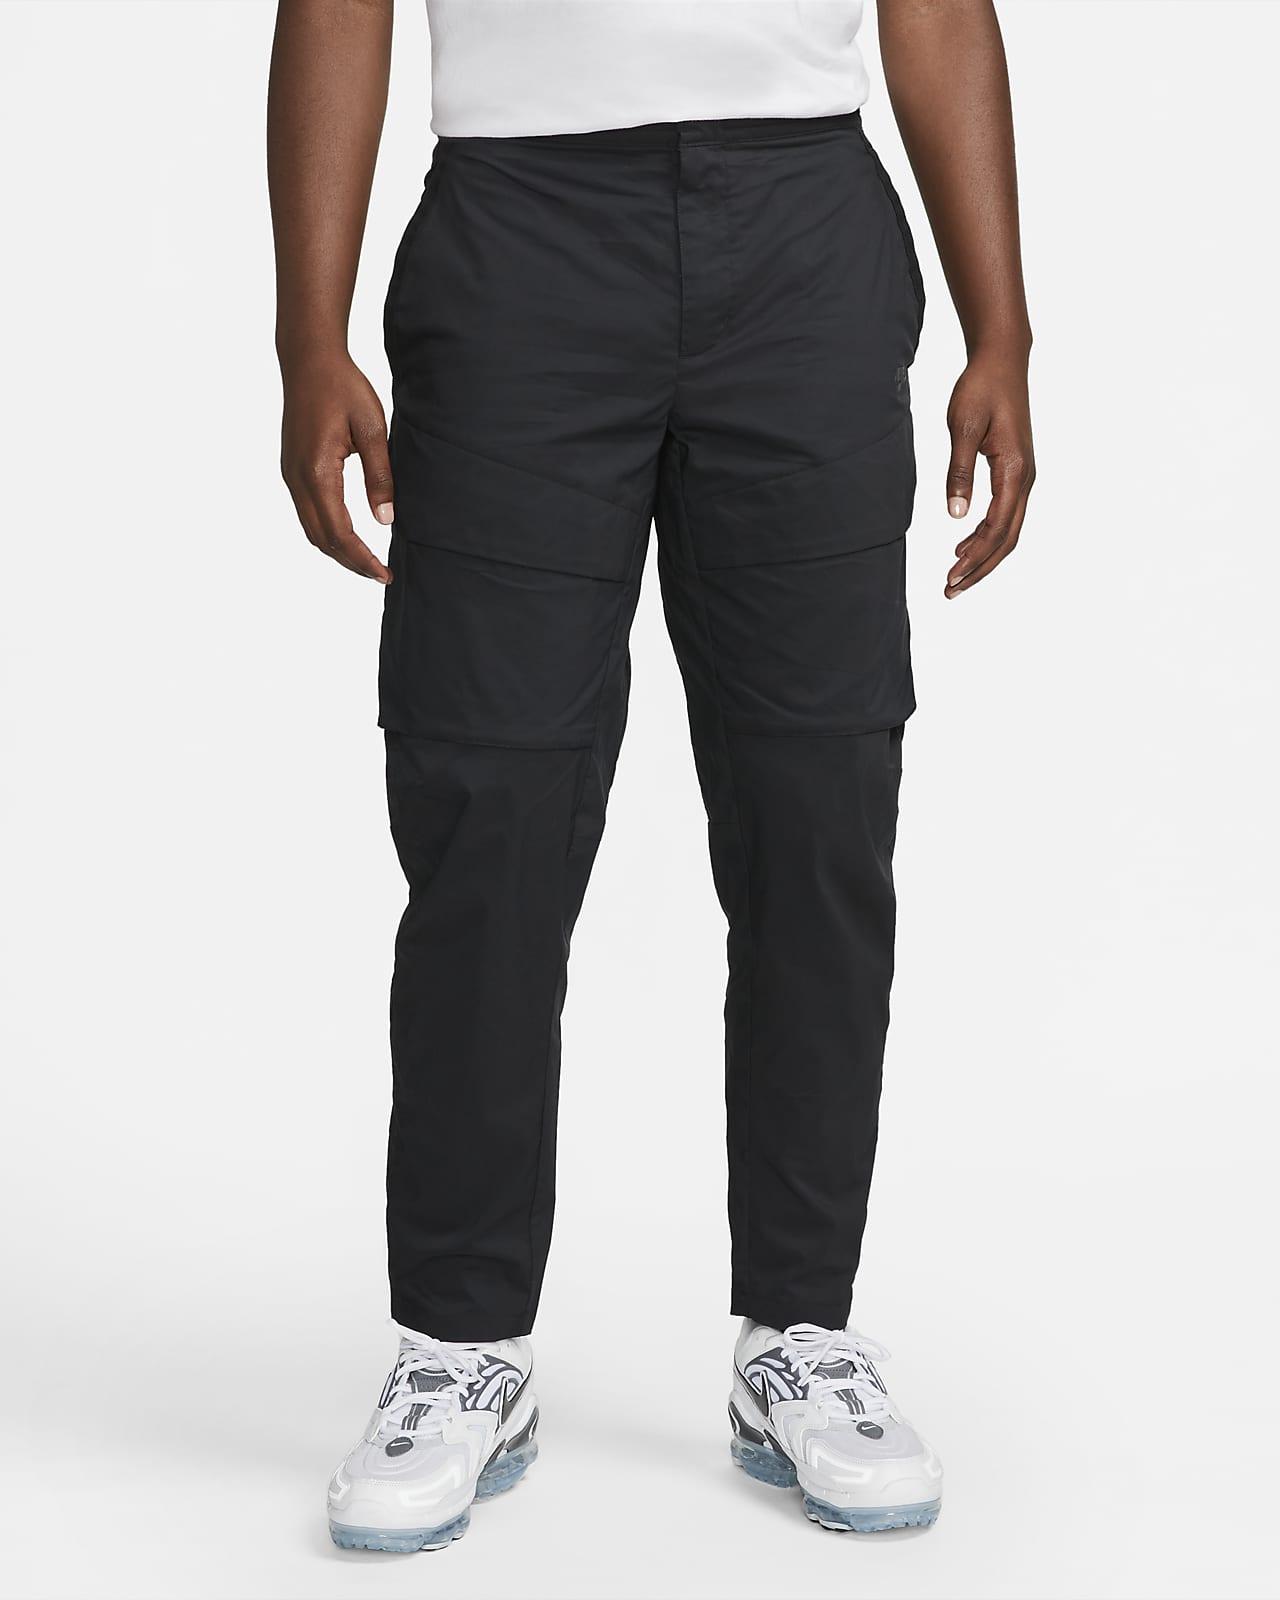 Nike Sportswear Tech Pack Erkek Kargo Pantolonu